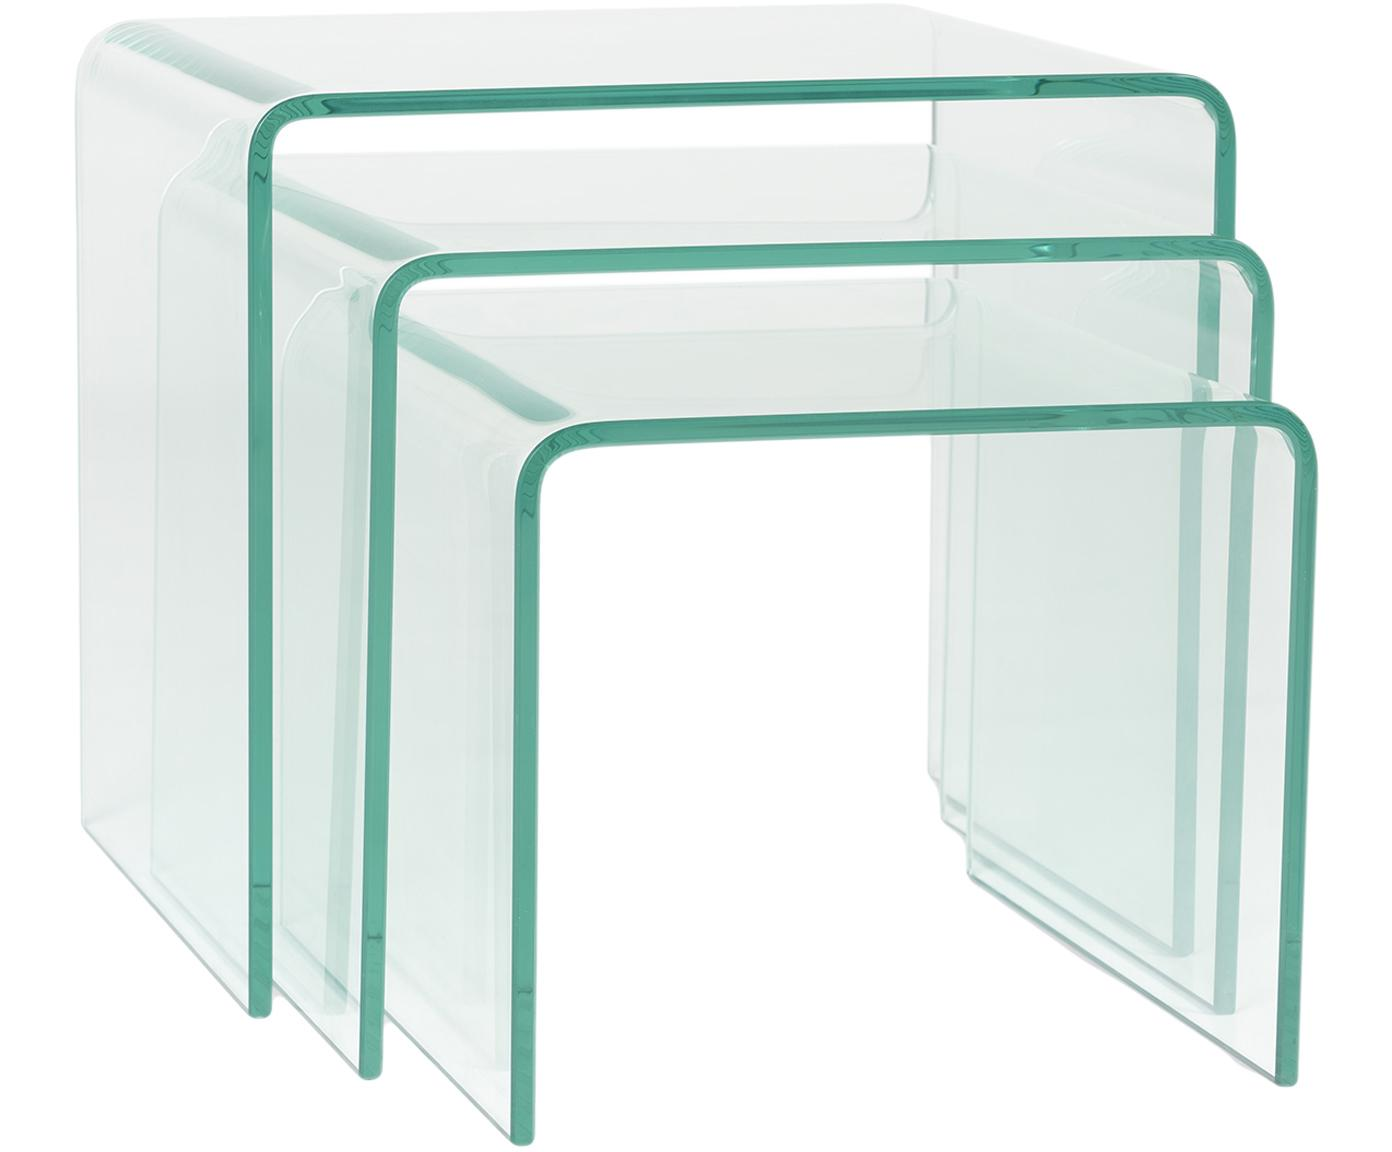 Set de mesas auxiliares Ringo, 3pzas., Vidrio templado, Transparente, Tamaños diferentes